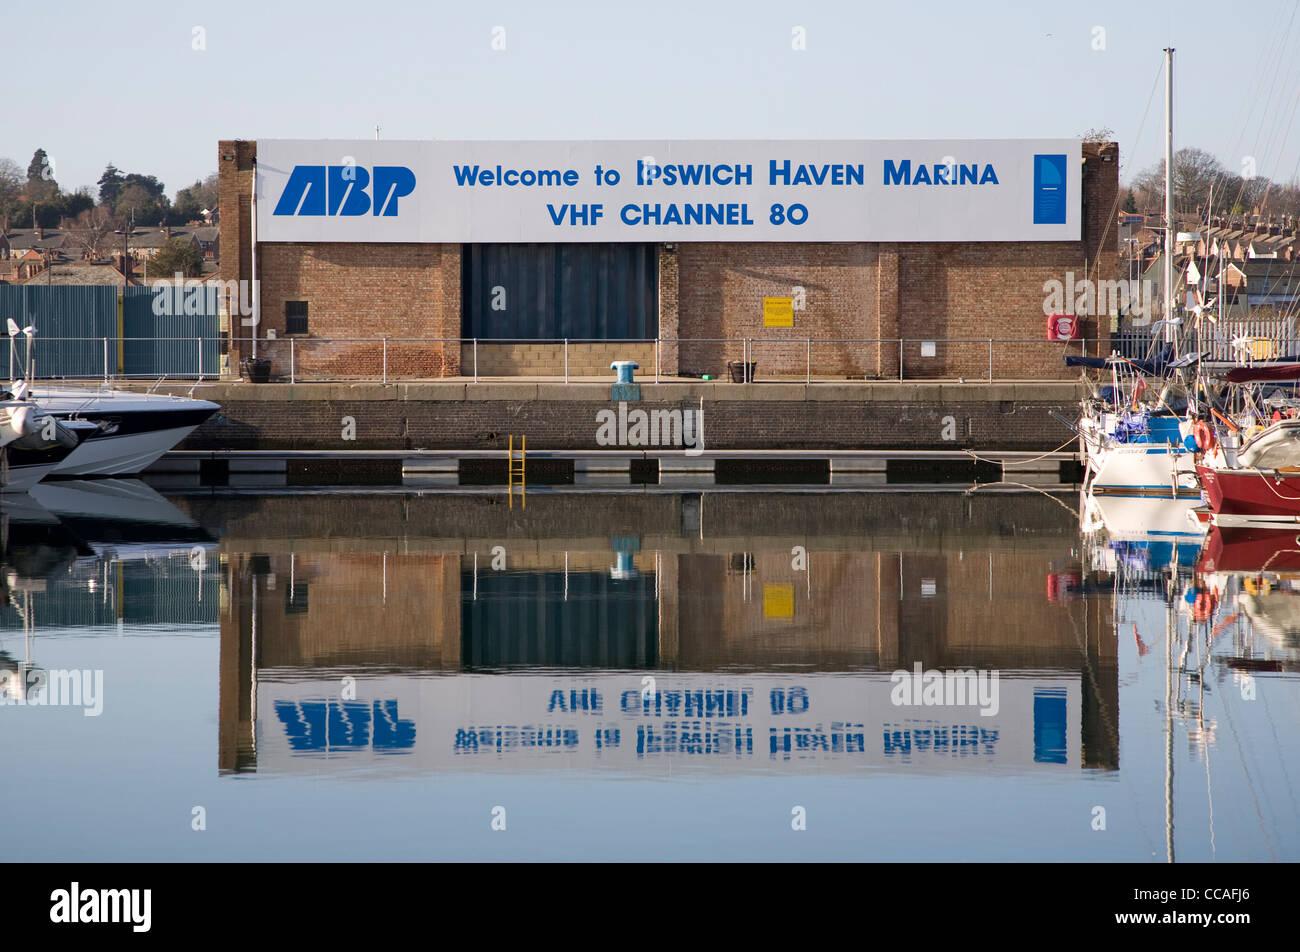 ABP VHF radio channel sigh Haven Marina Ipswich - Stock Image